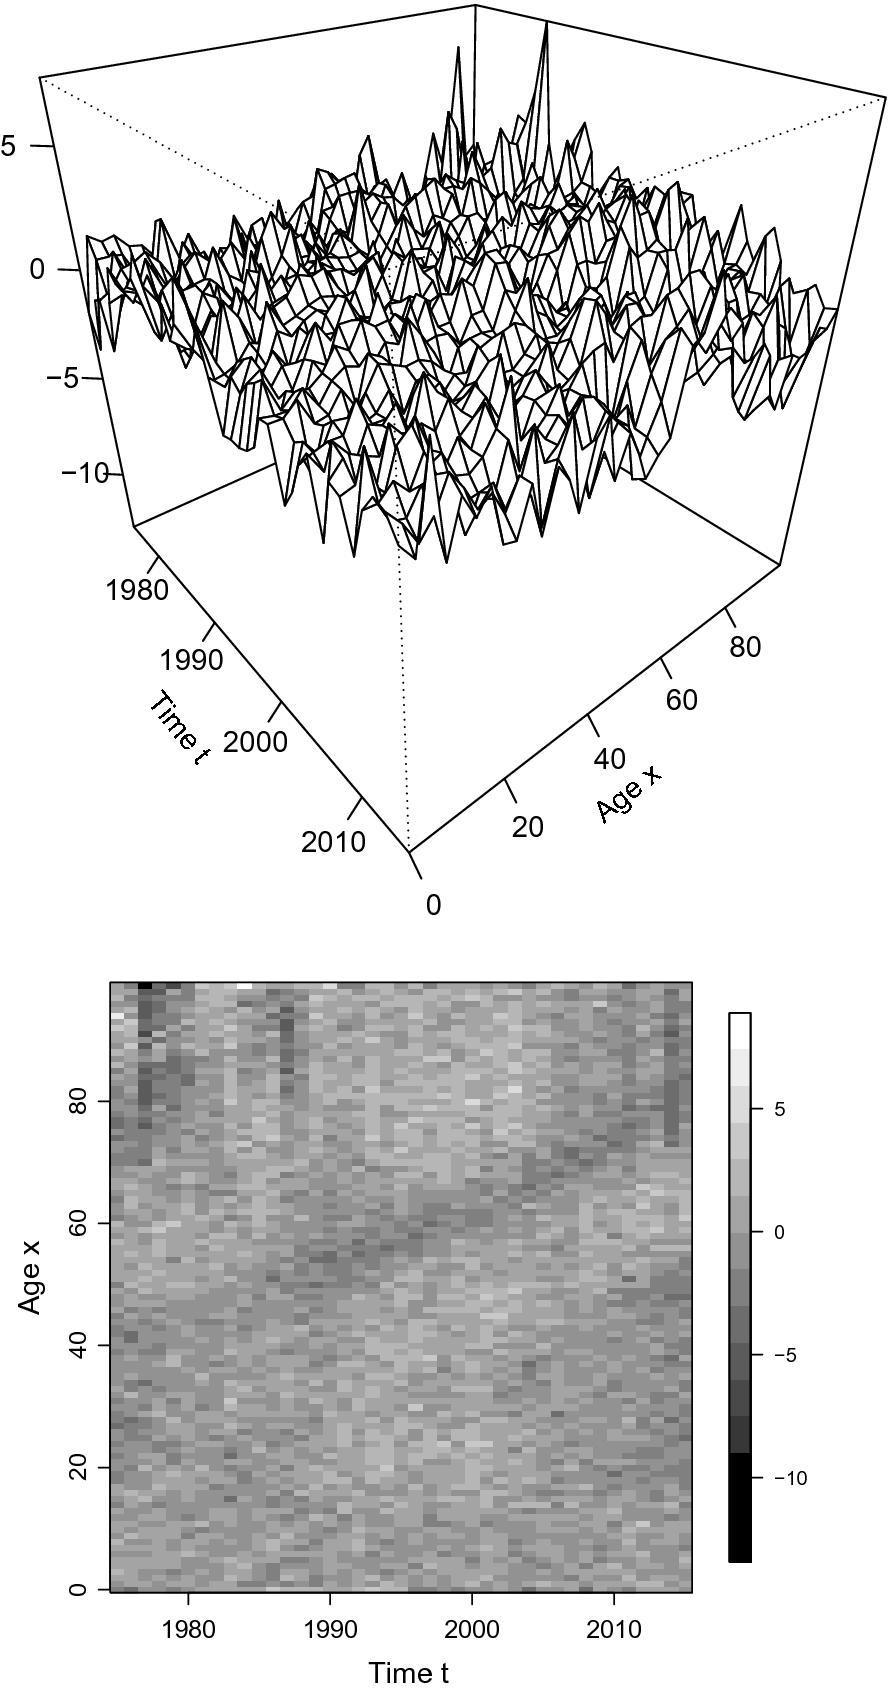 Some Generalized Non-linear Models (GNMs) | SpringerLink